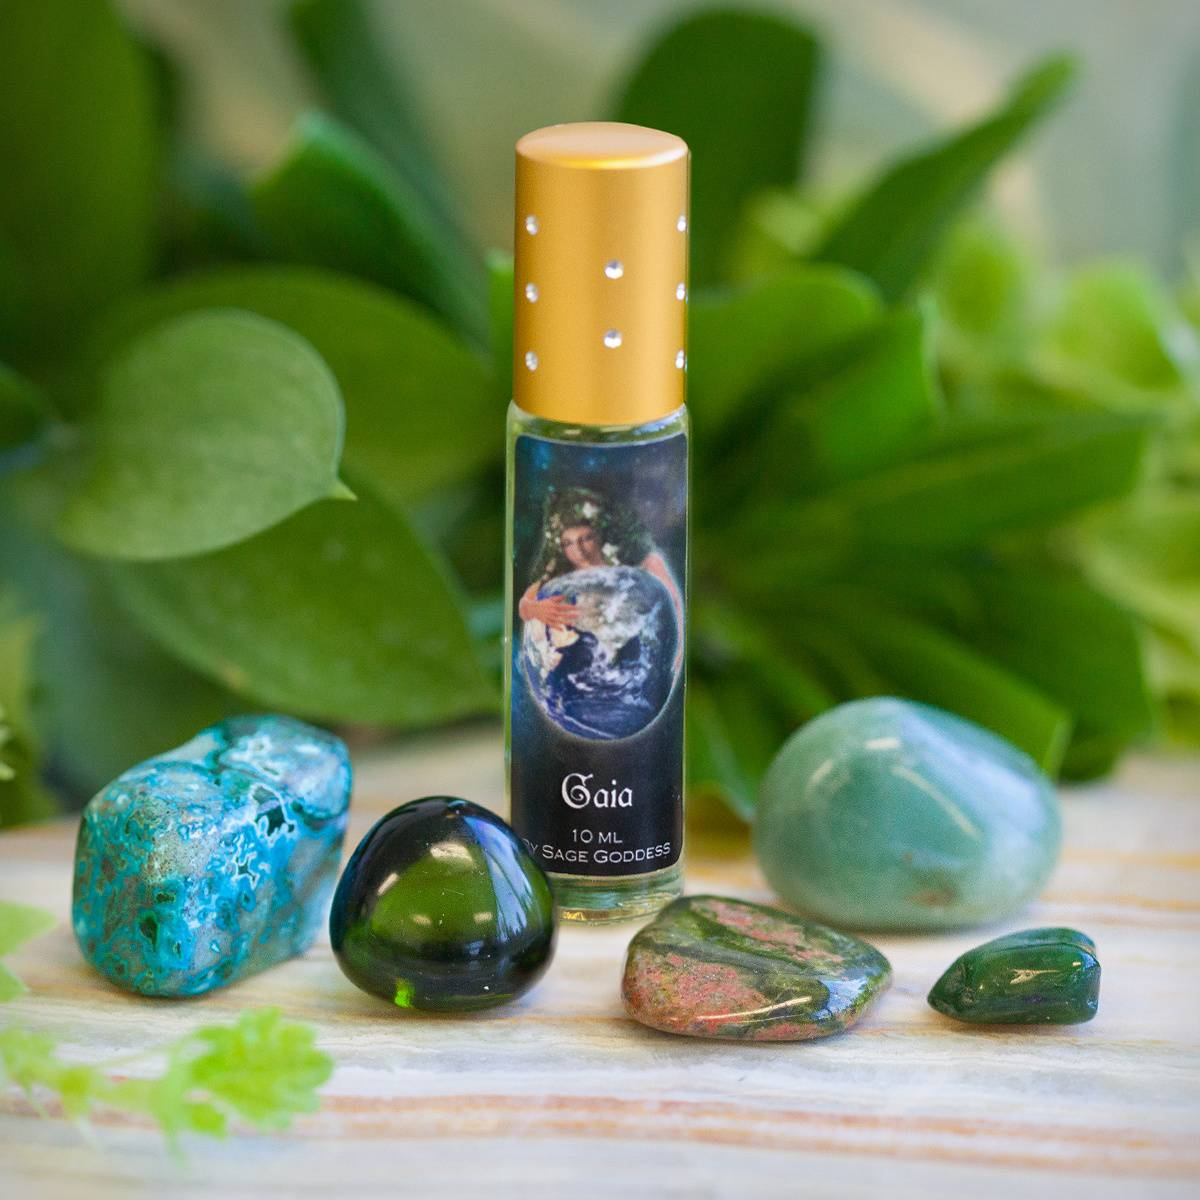 Gaia Gemstone Set with Gaia Perfume 4_22